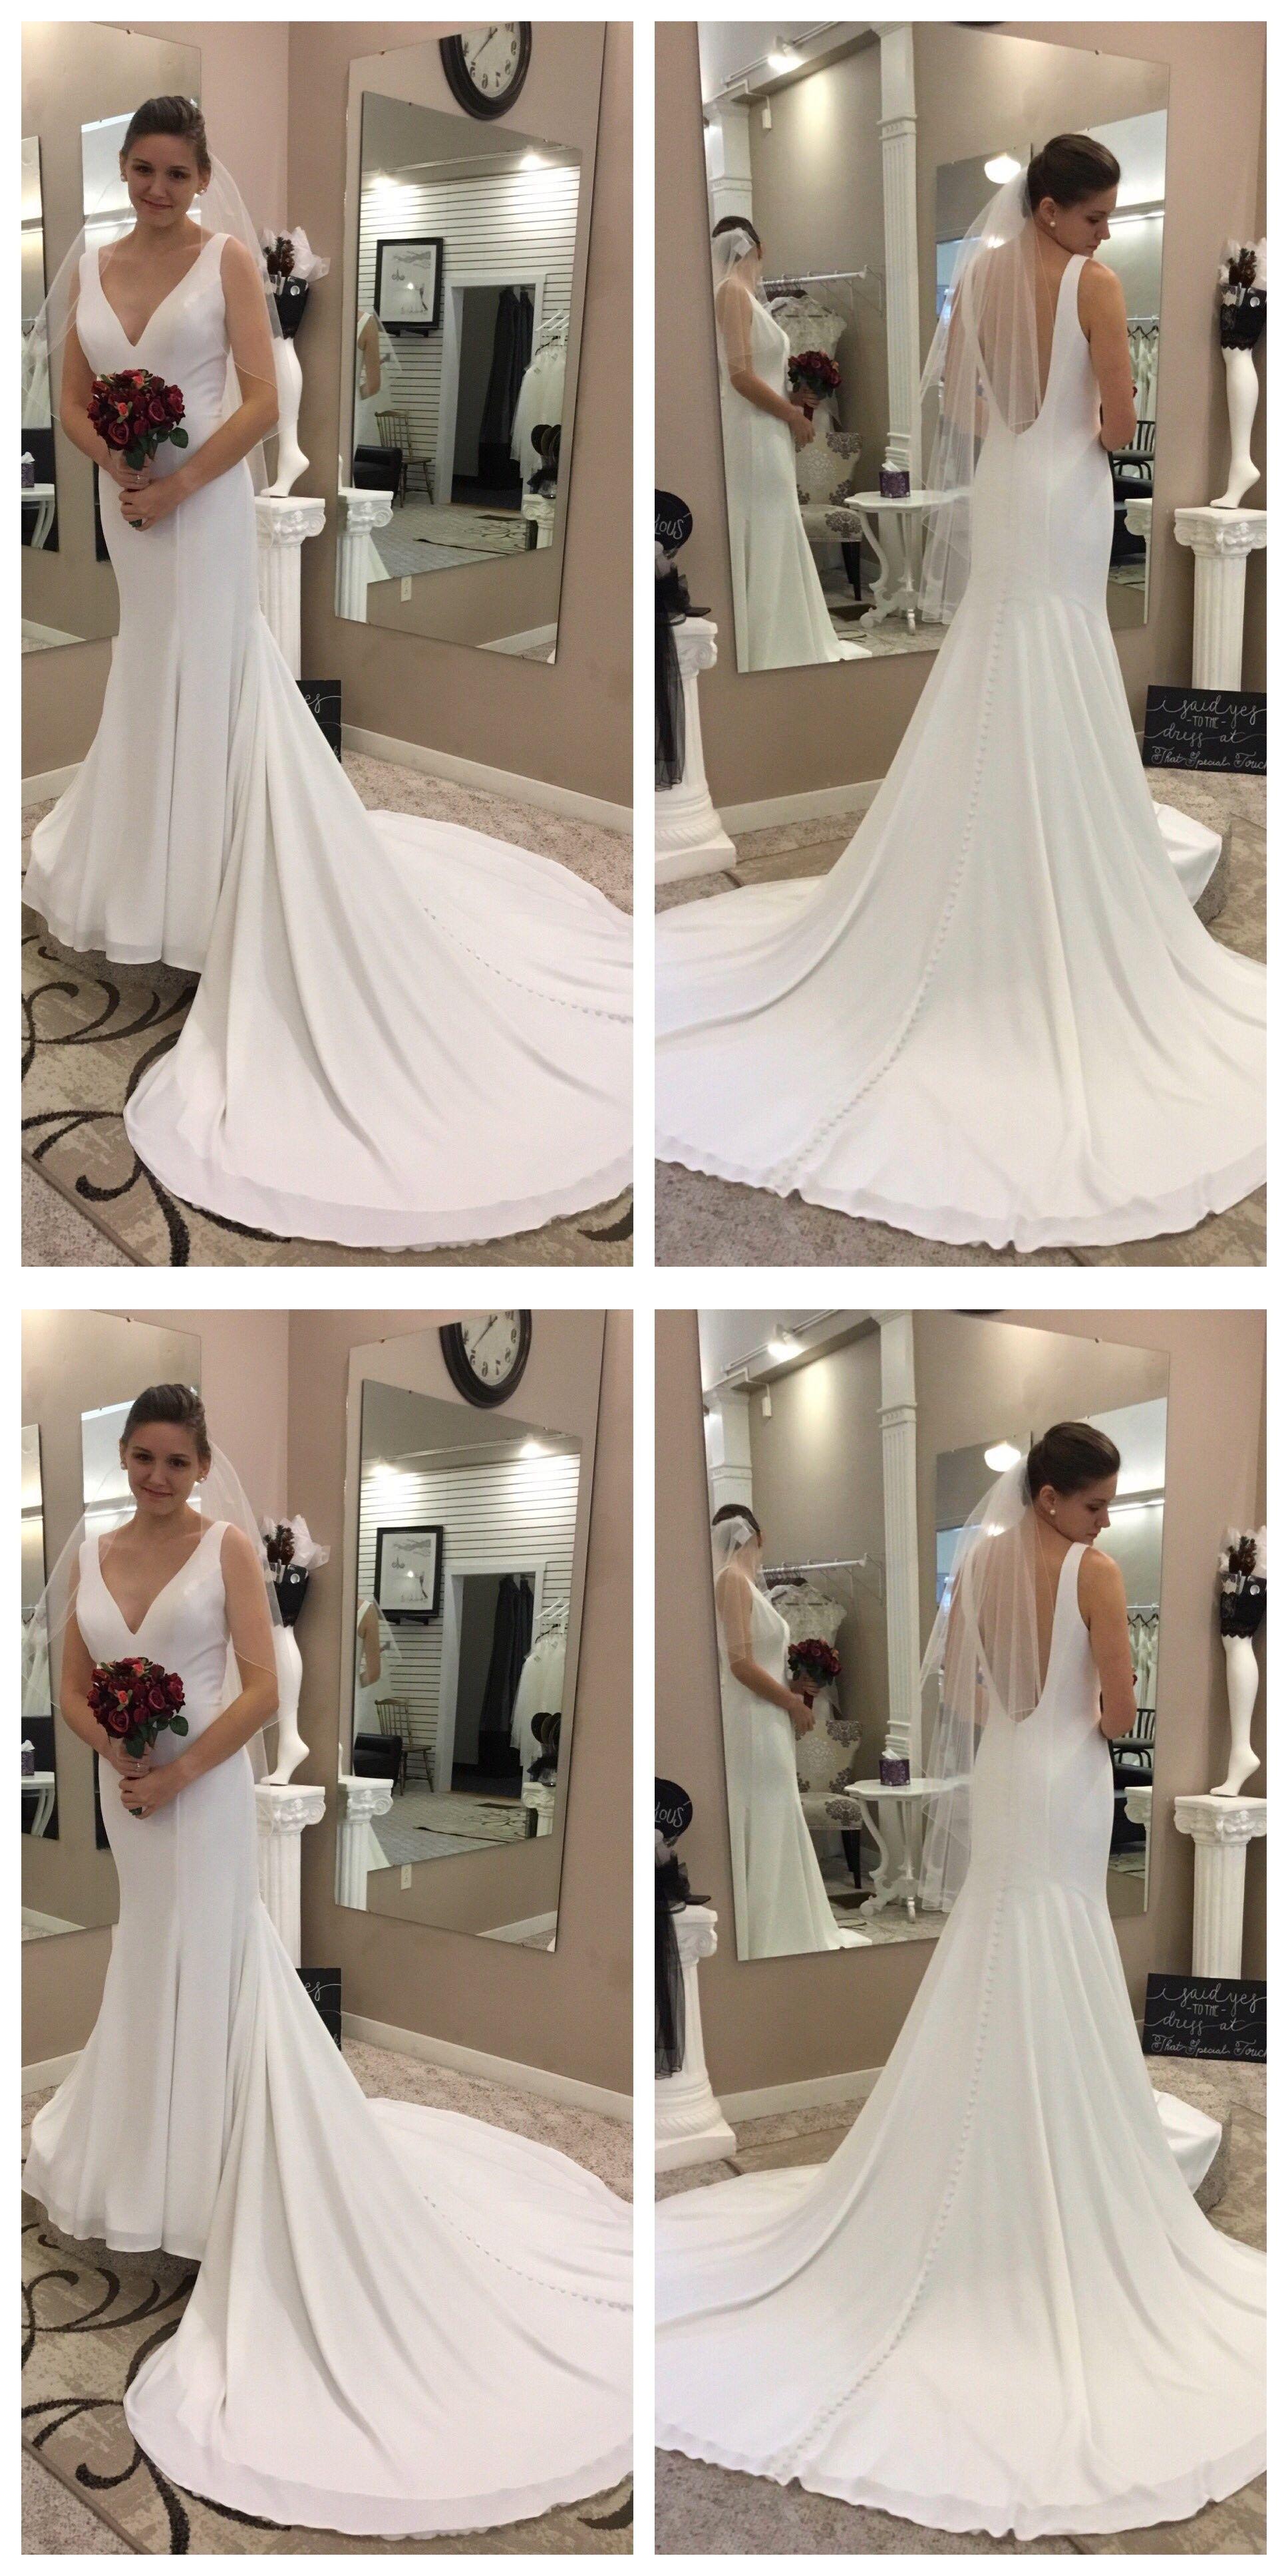 Ivory beach wedding dresses  Mermaid VNeck Court Train Sleeveless Chiffon Wedding Dress  Prom